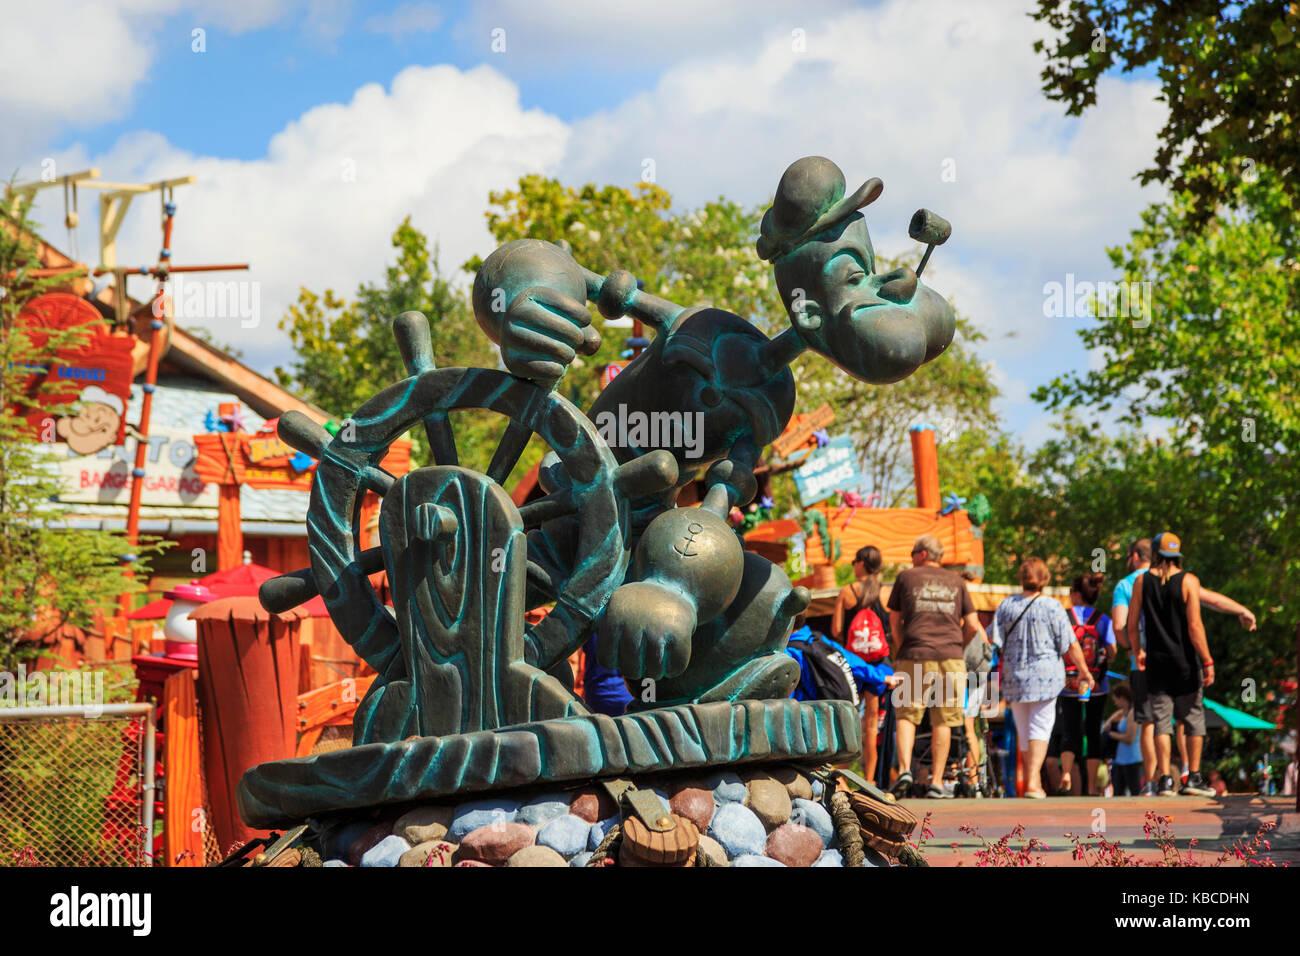 Statue of Popeye, cartoon character, Universal Studios, Orlando, Florida, America - Stock Image